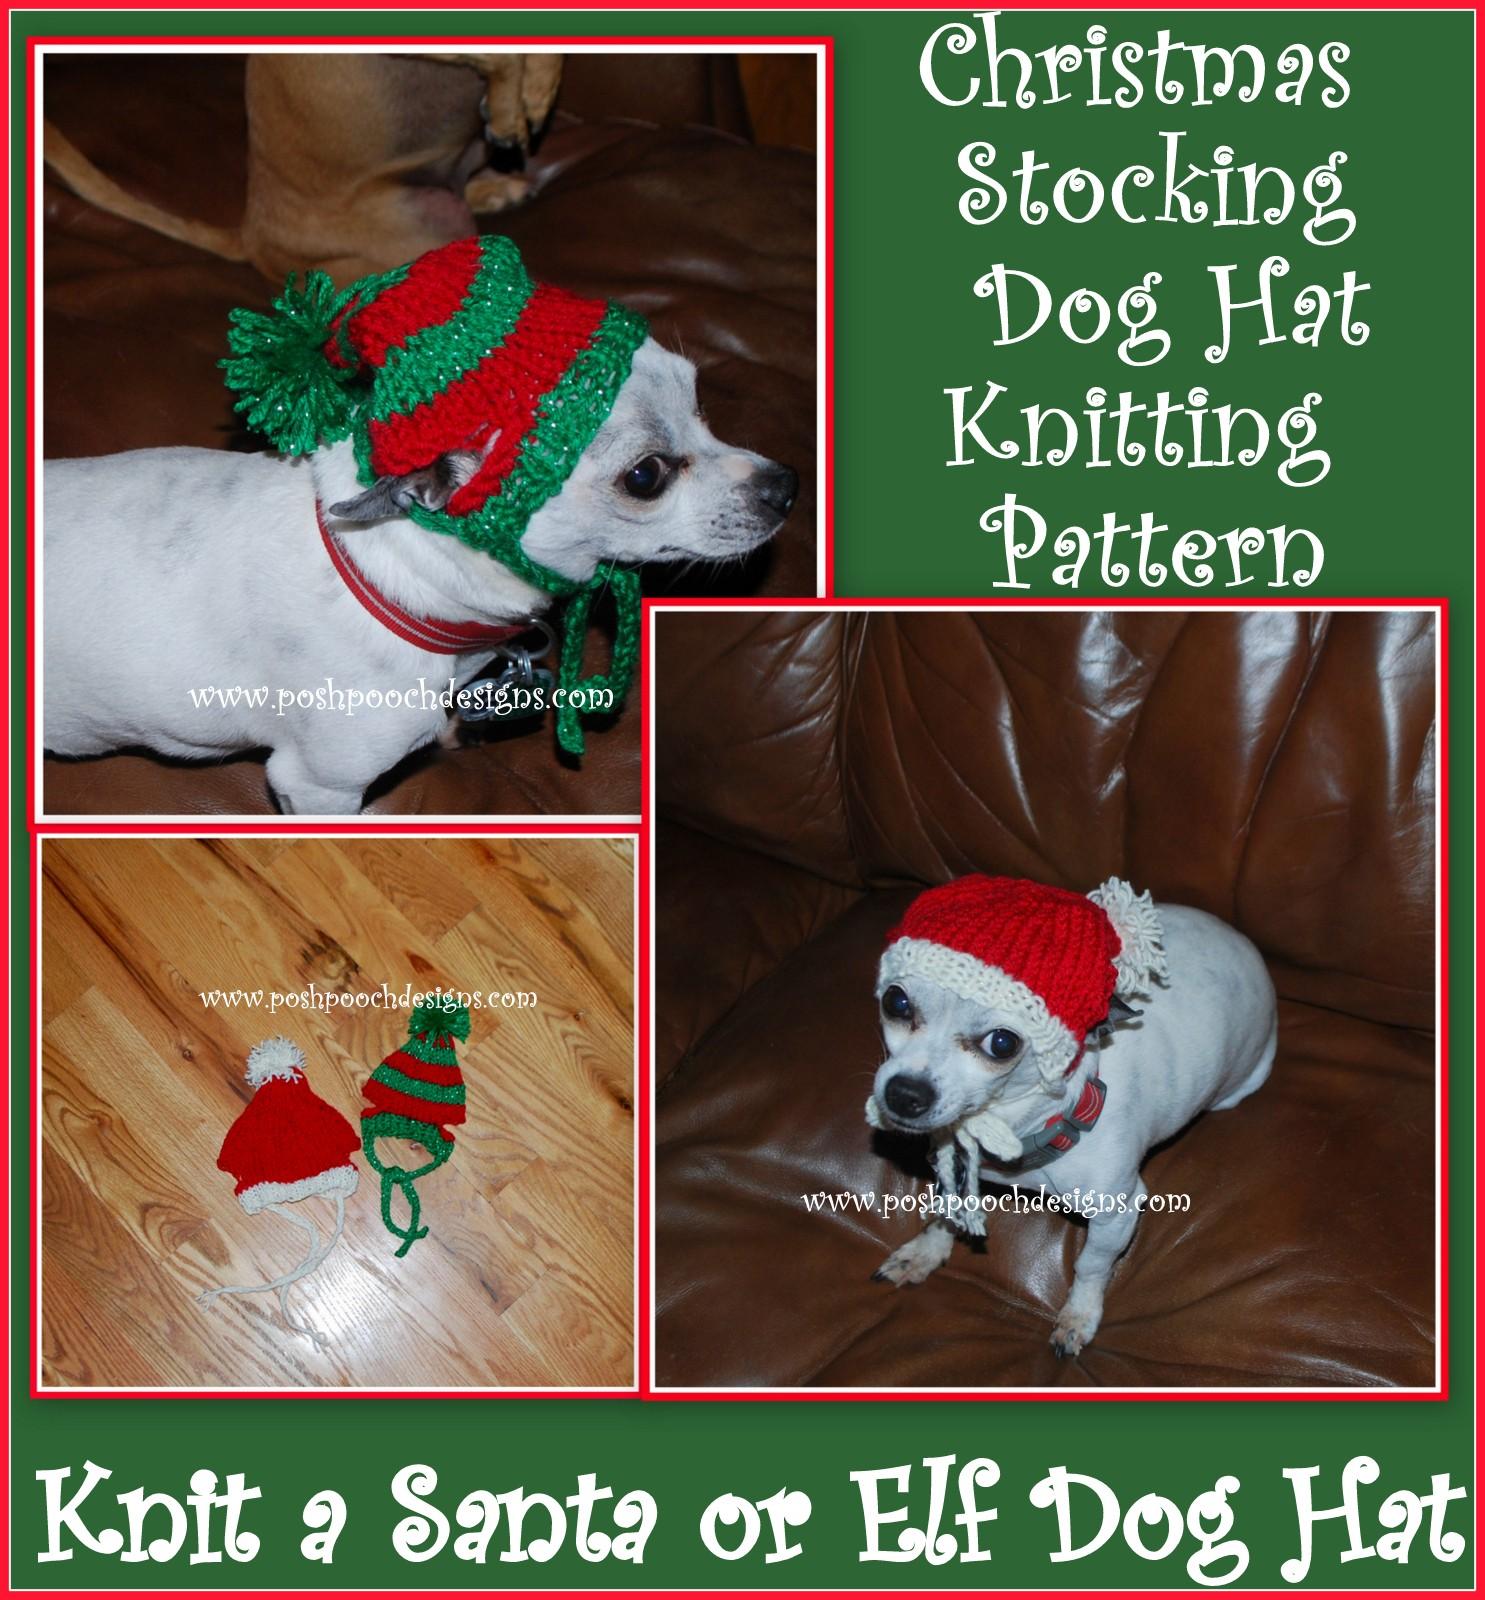 Posh Pooch Designs Dog Clothes Christmas Stocking Dog Hat Knitting